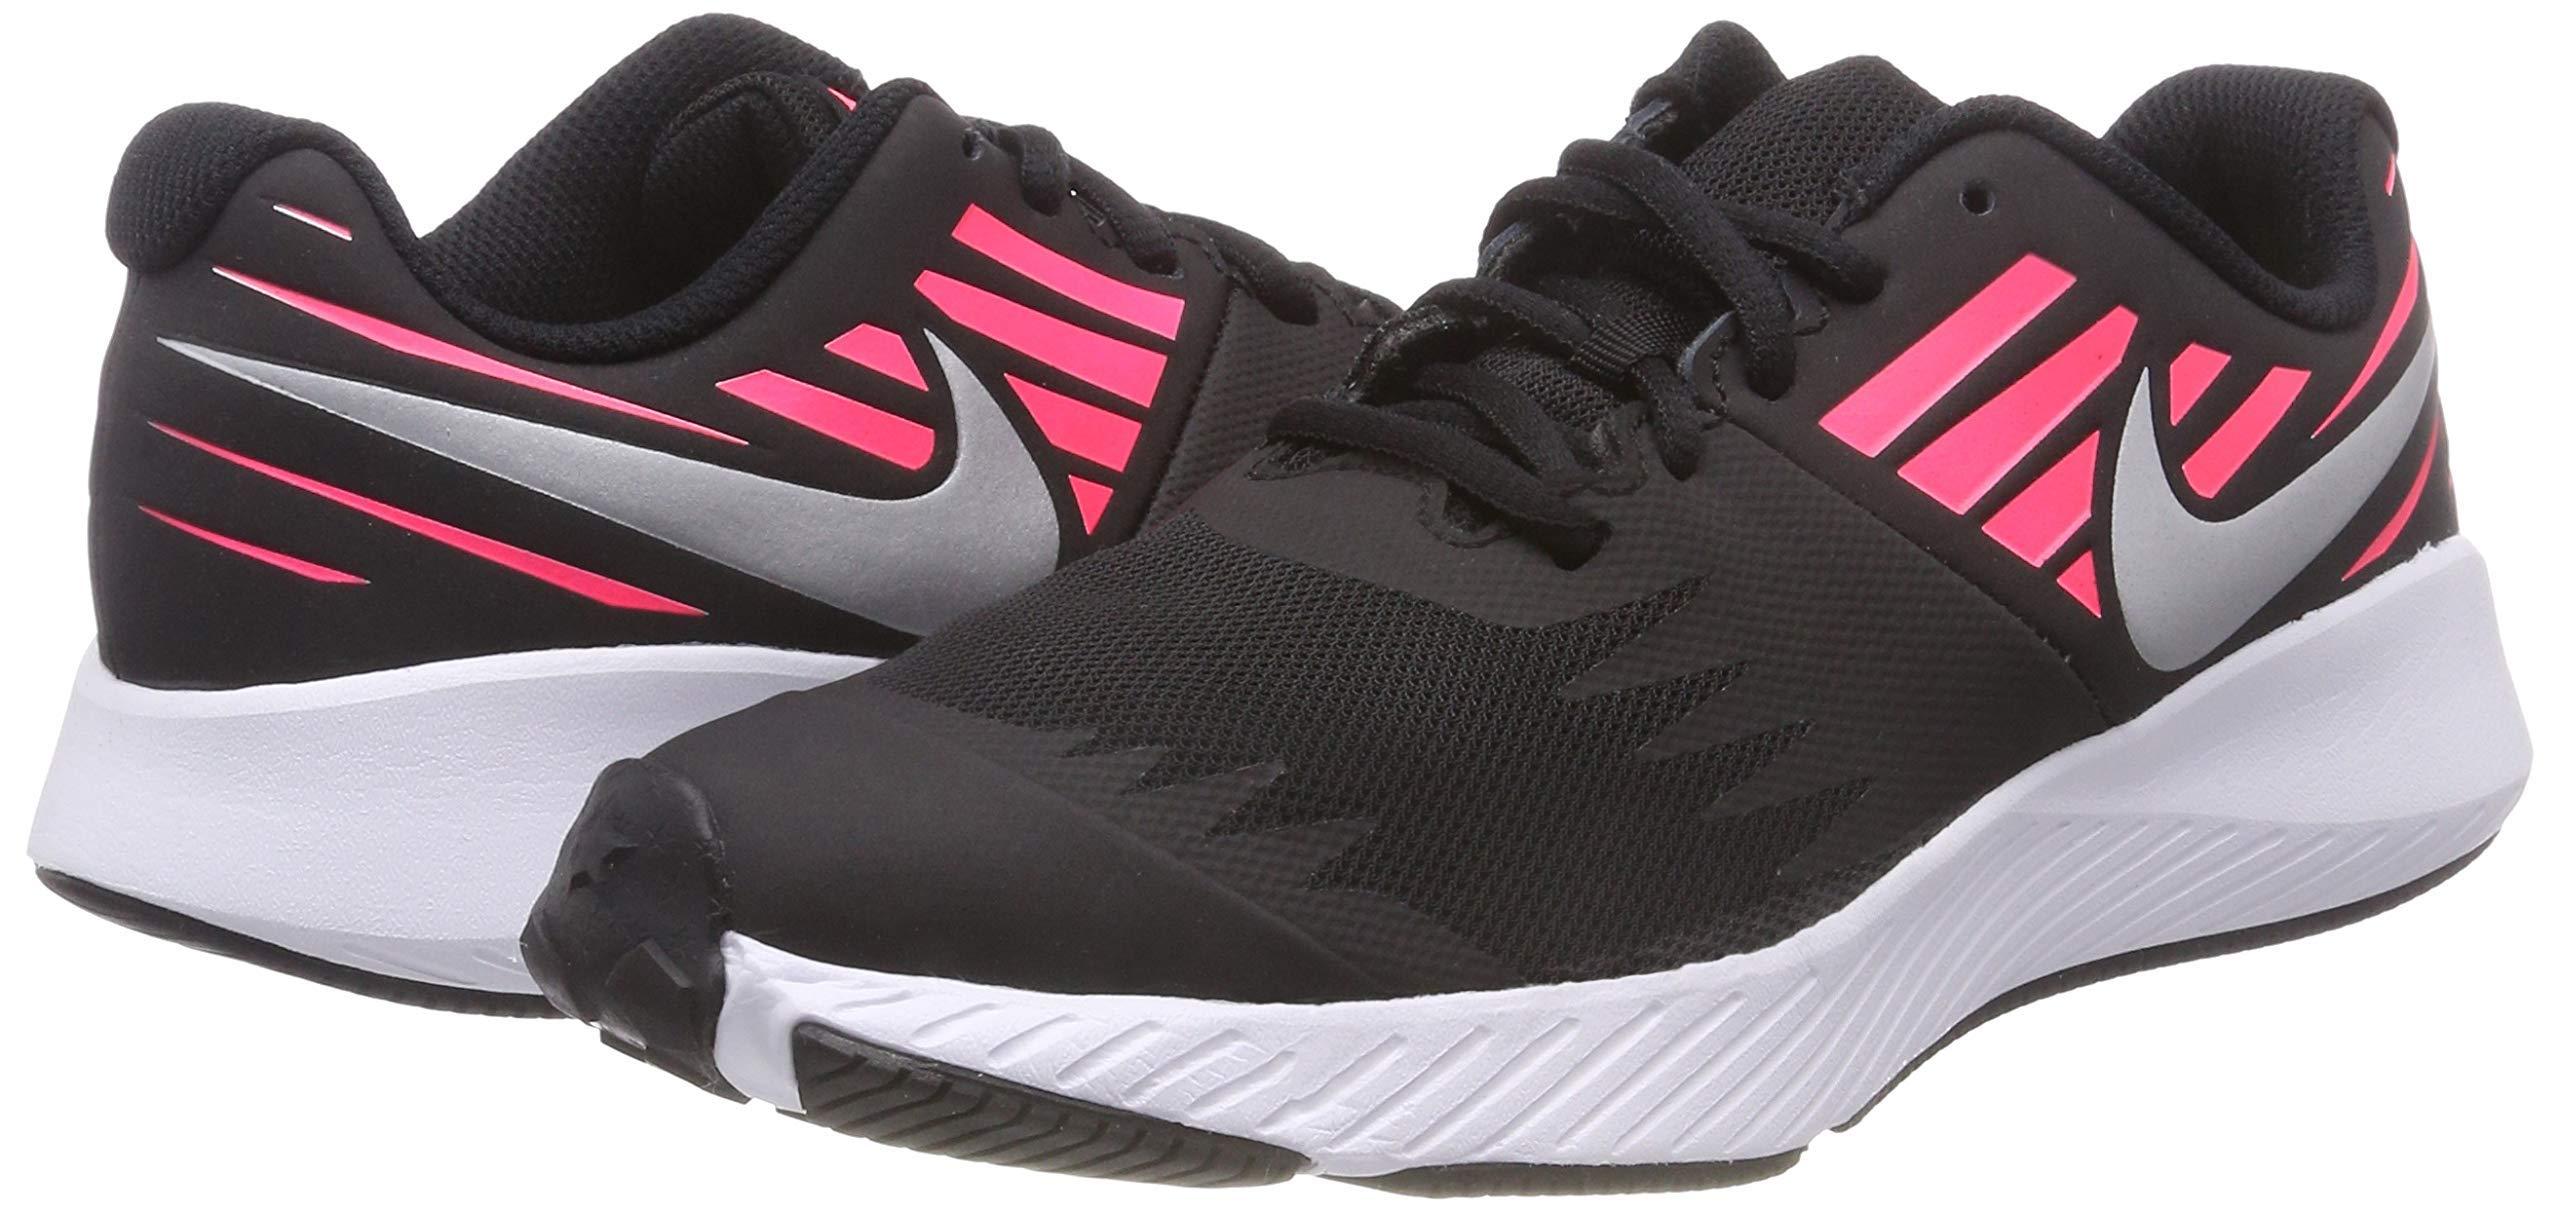 Nike Girl's Star Runner (GS) Running Shoe Black/Metallic Silver/Racer Pink/Volt Size 3.5 M US by Nike (Image #8)